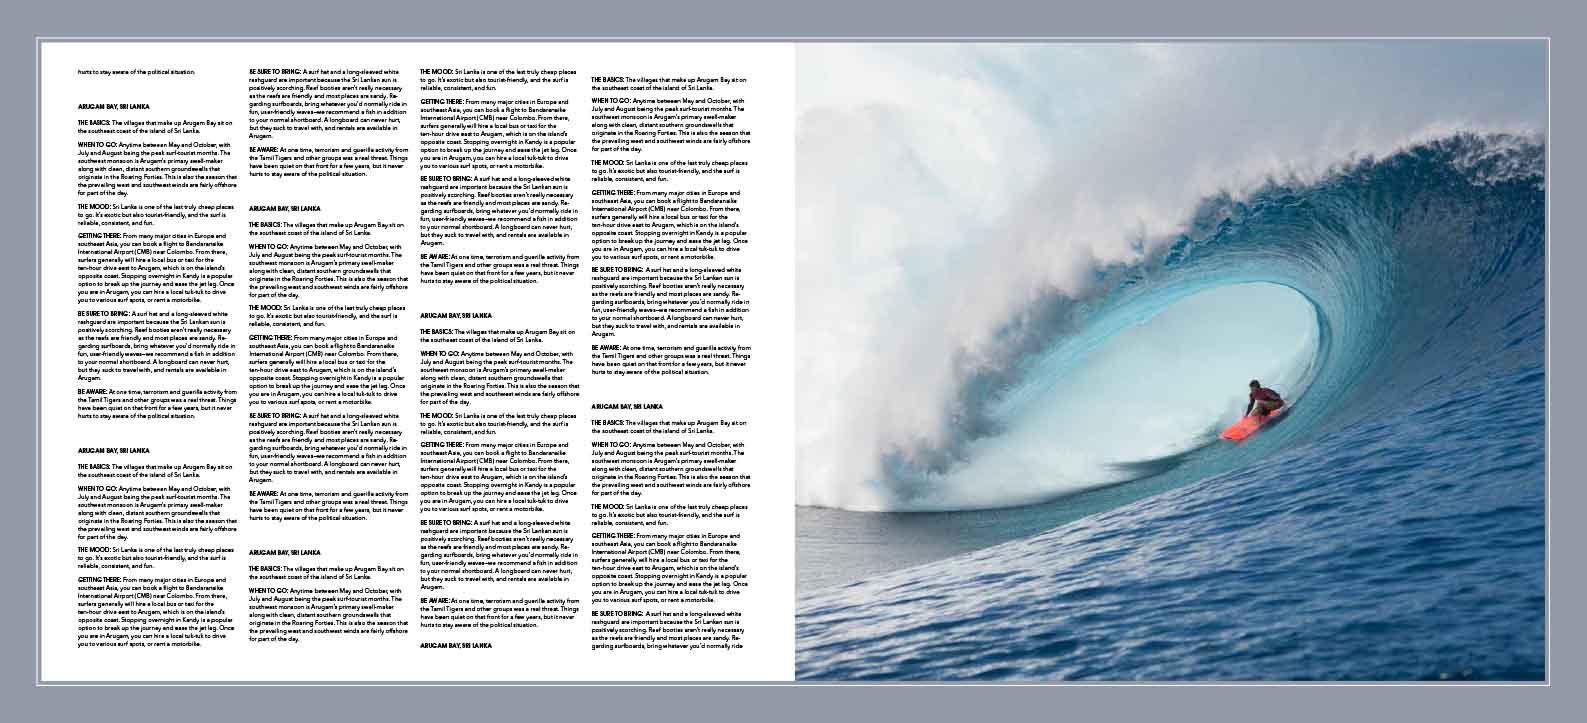 SURFpages217-240-7.jpg